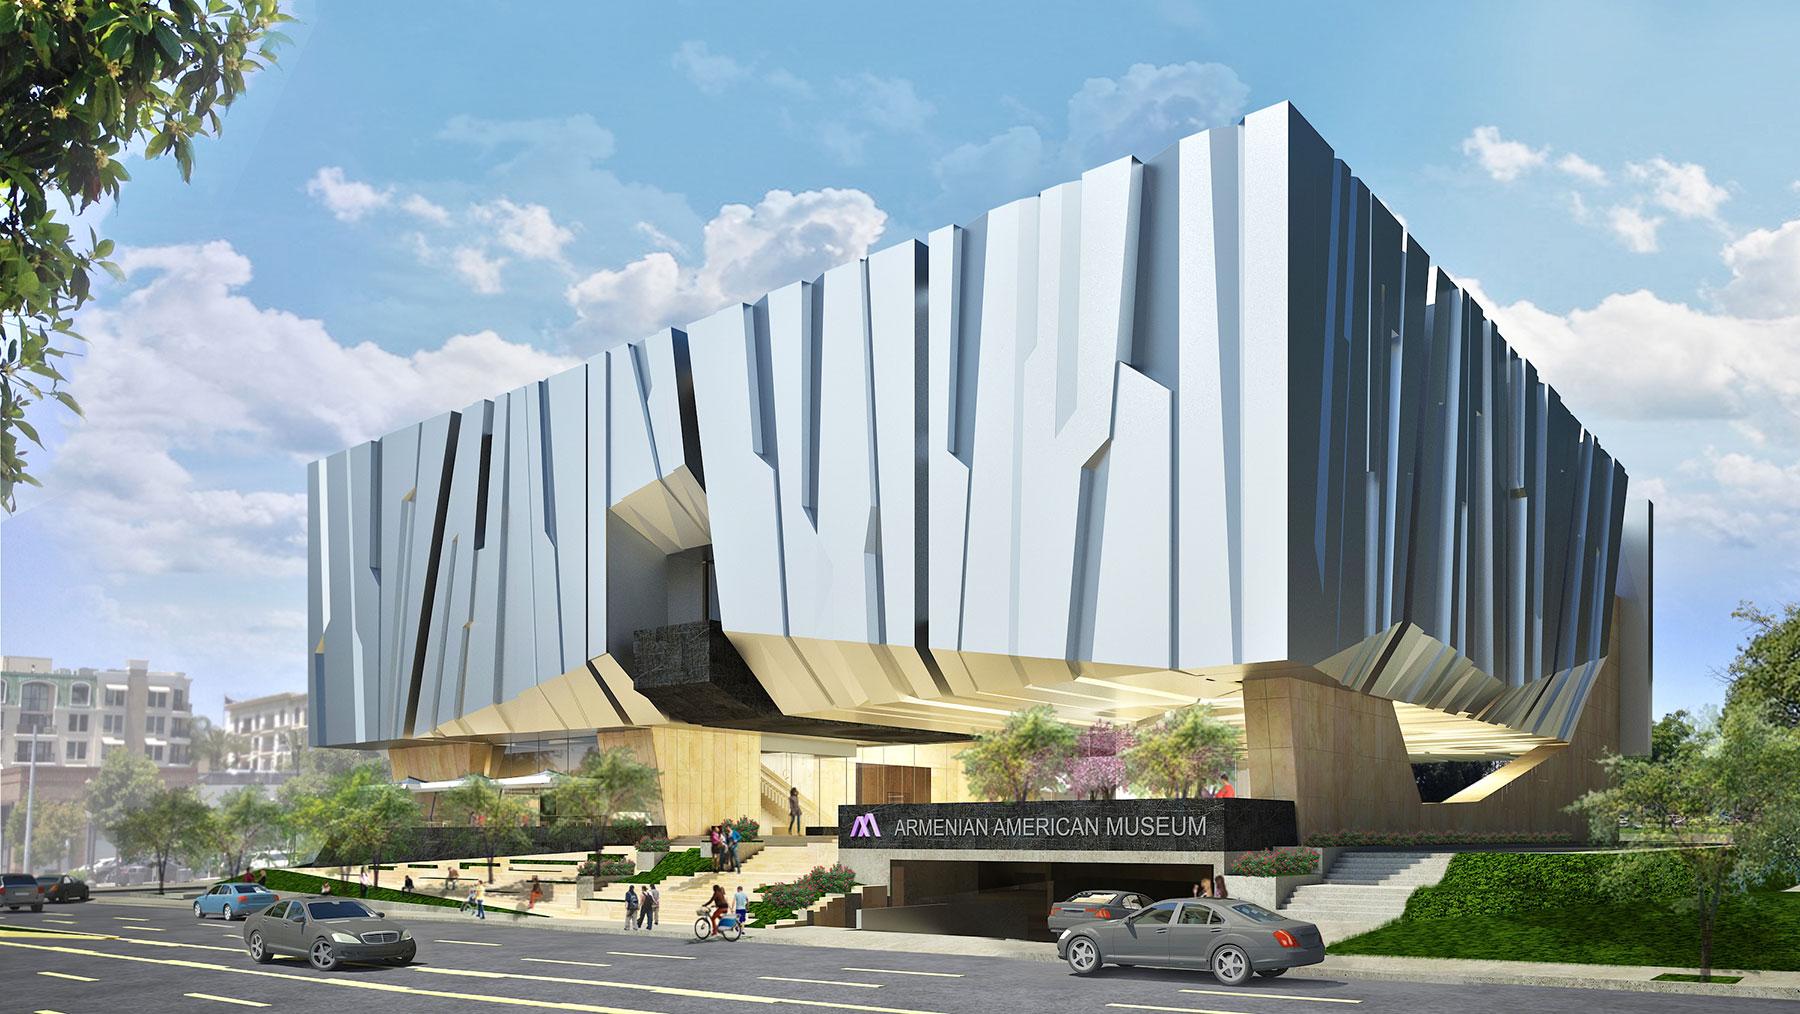 Armenian American Museum Exterior Profile